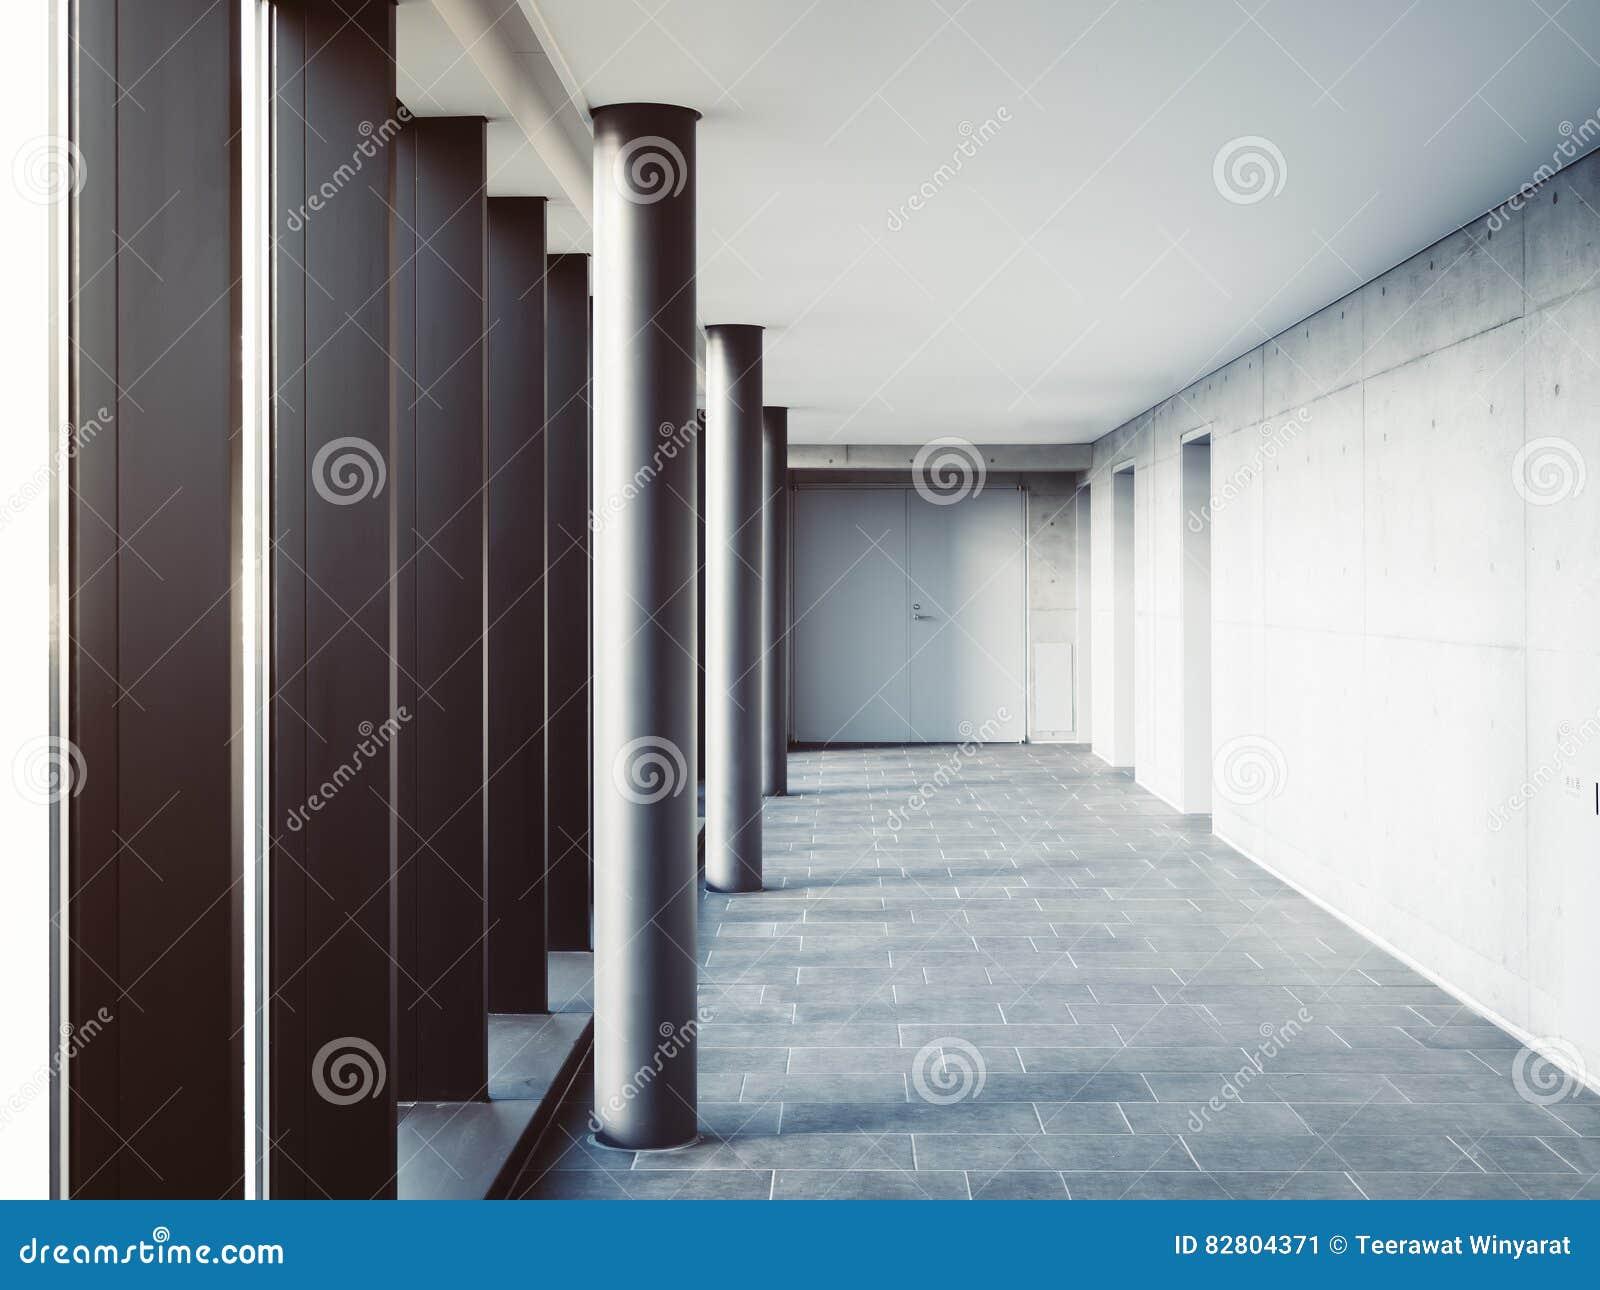 Beautiful Modern Architecture Column Detail Columns Building Minimal Space Stock Photo Inside Design Decorating